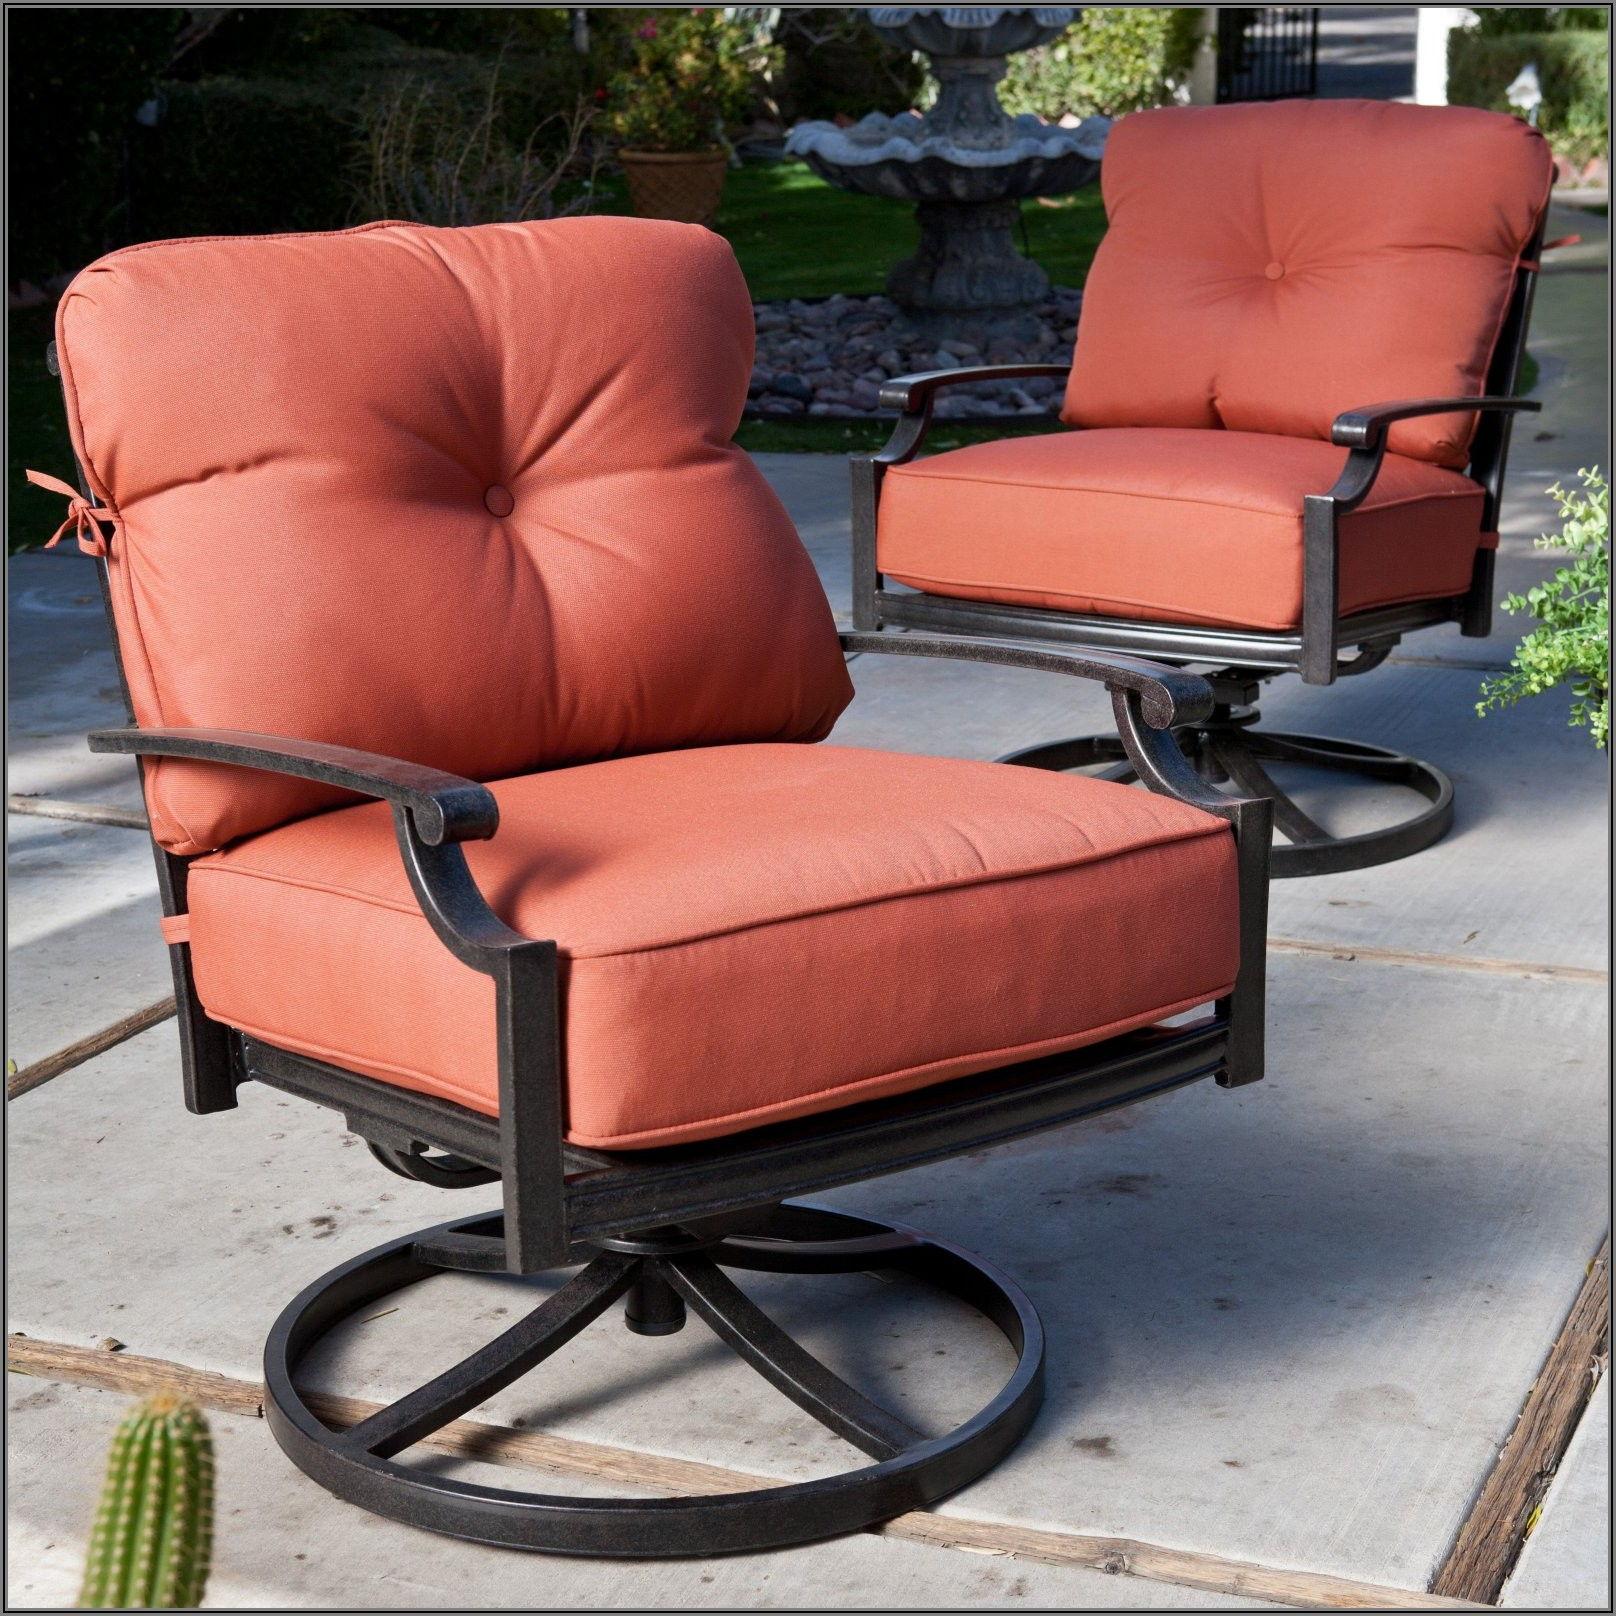 Cast Iron Swivel Patio Chairs